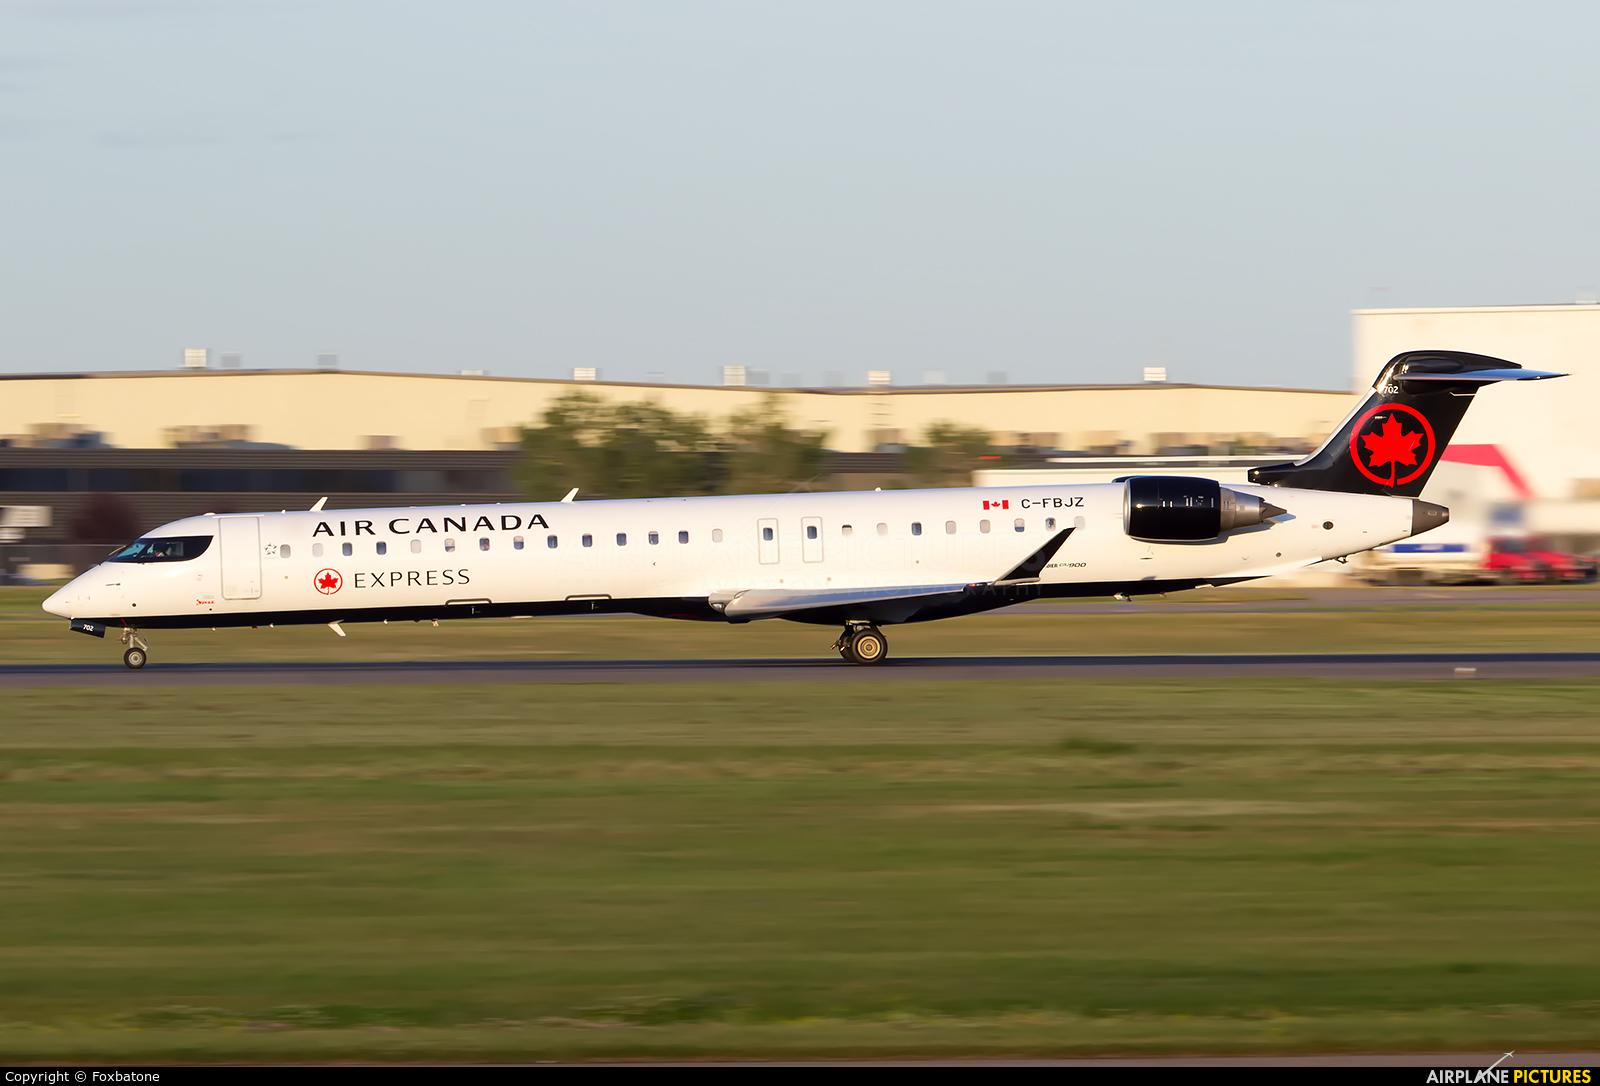 Air Canada Express C-FBJZ aircraft at Calgary Intl, AB